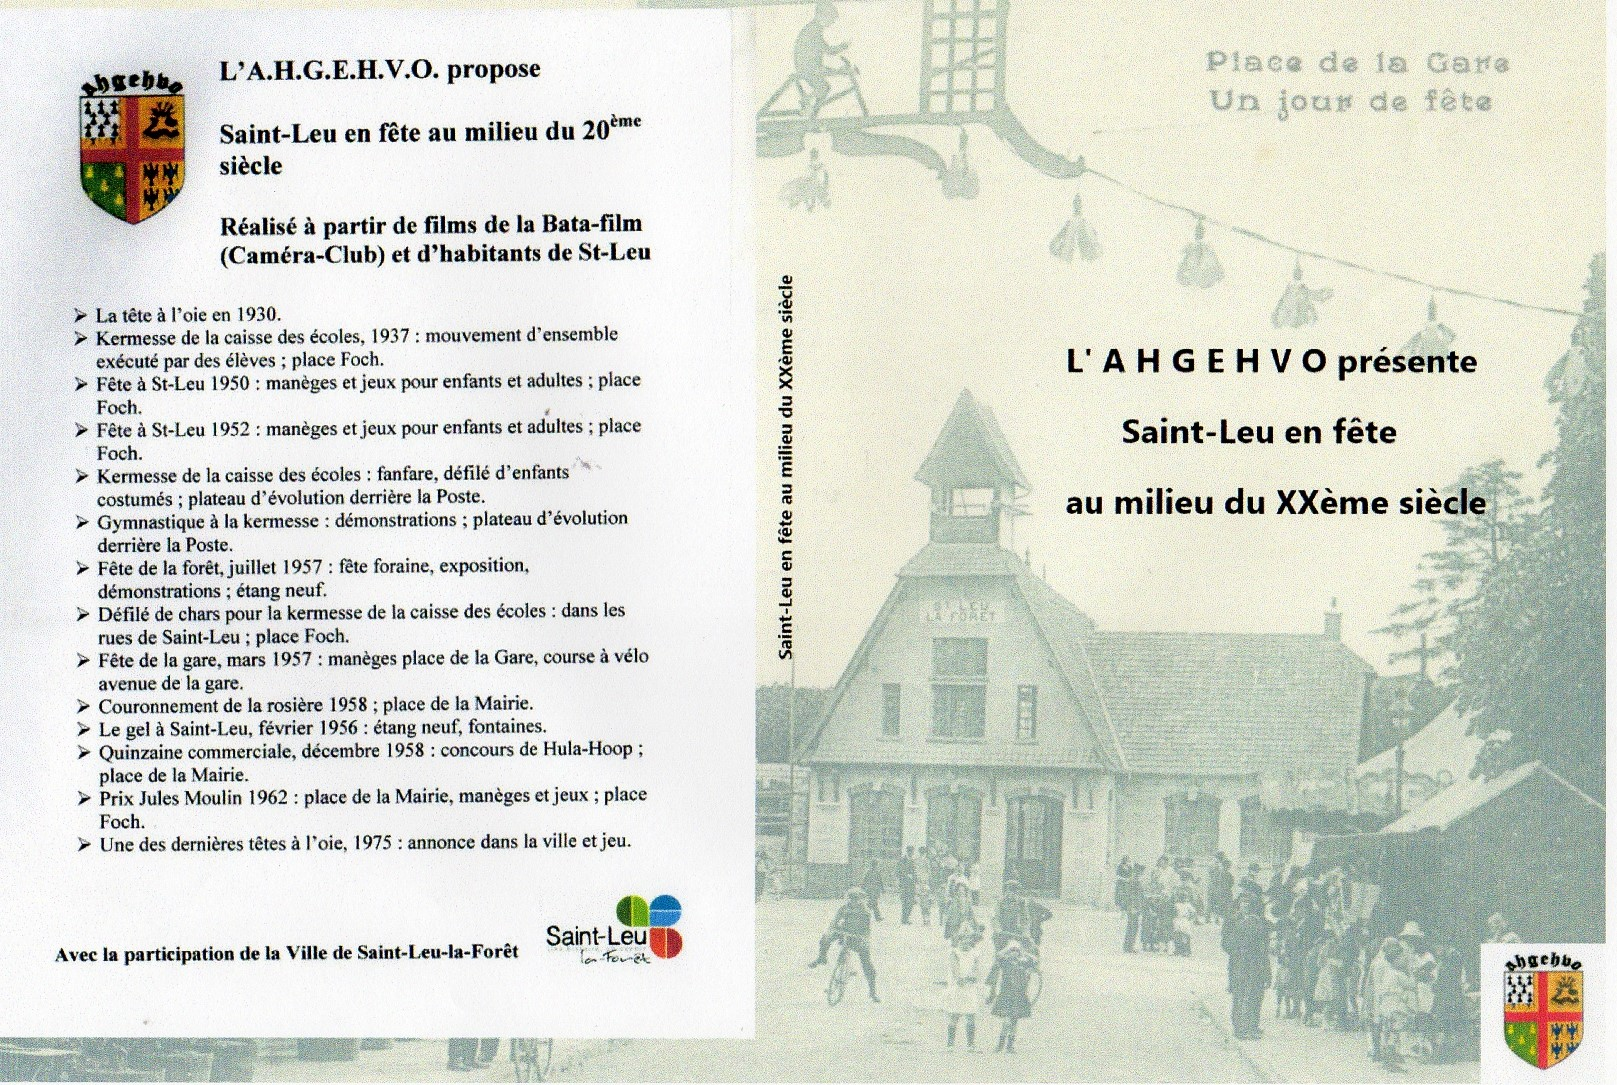 dvd 1435